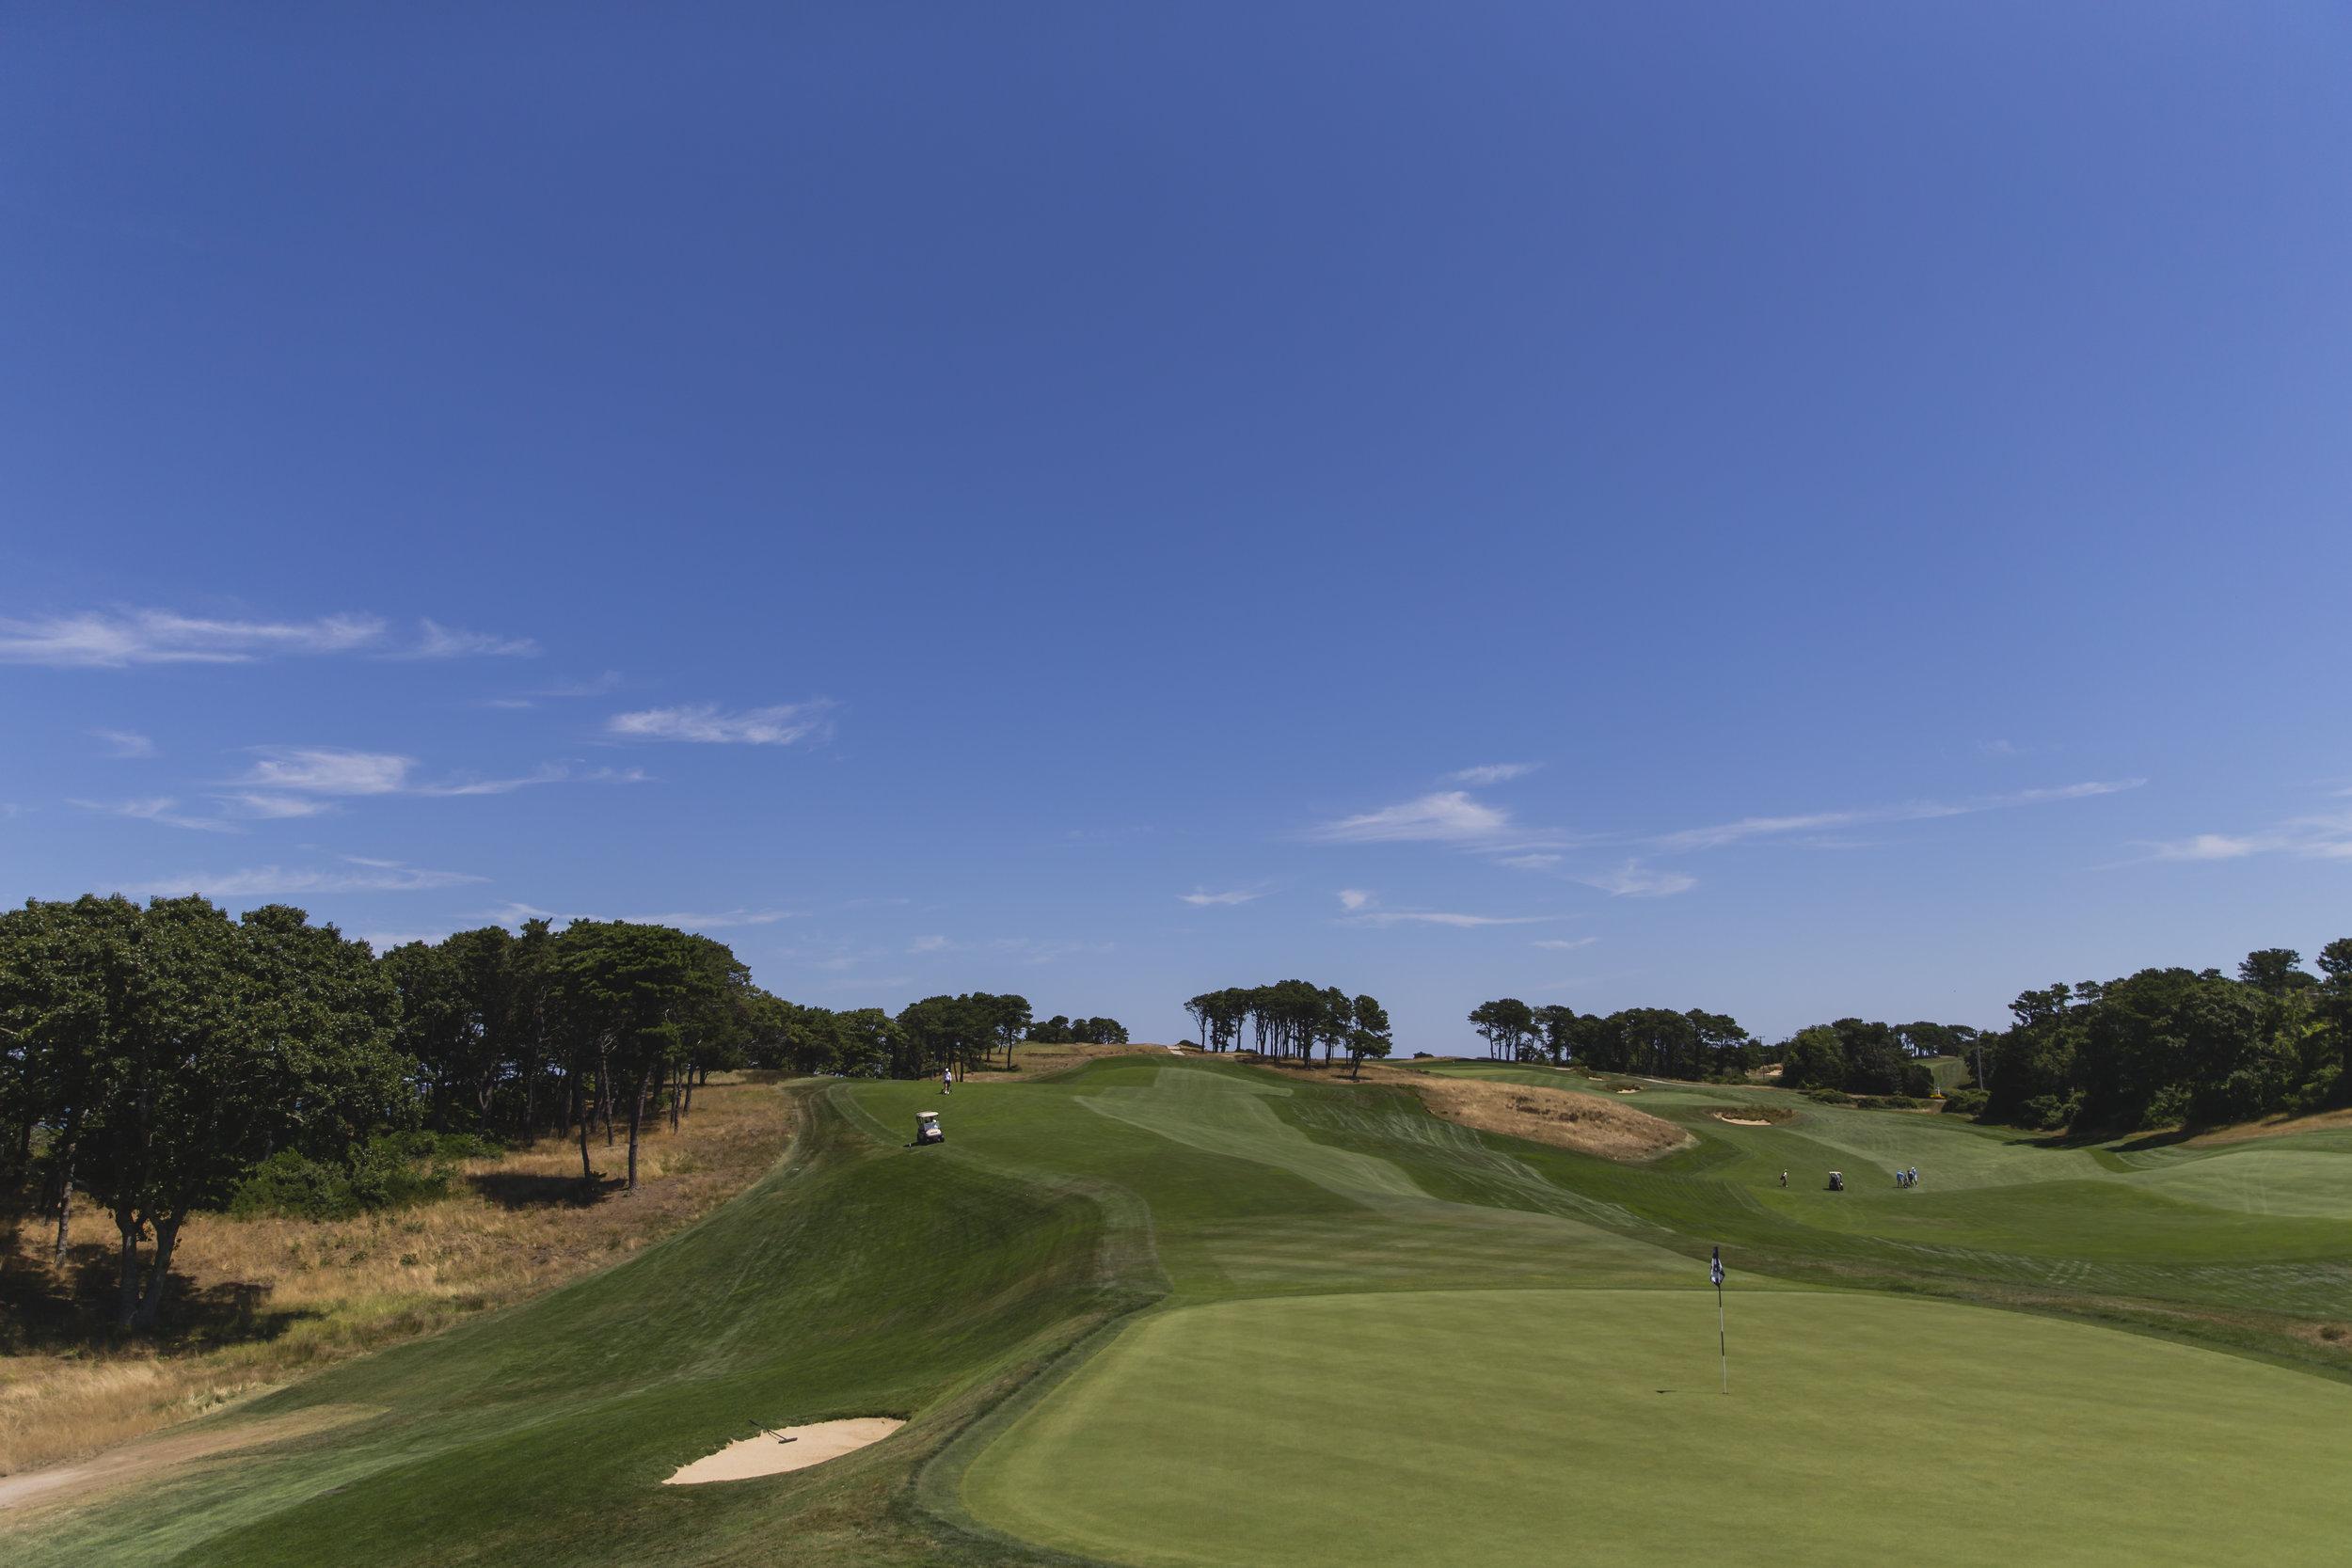 golf-course-photography-cape-cod-3.jpg